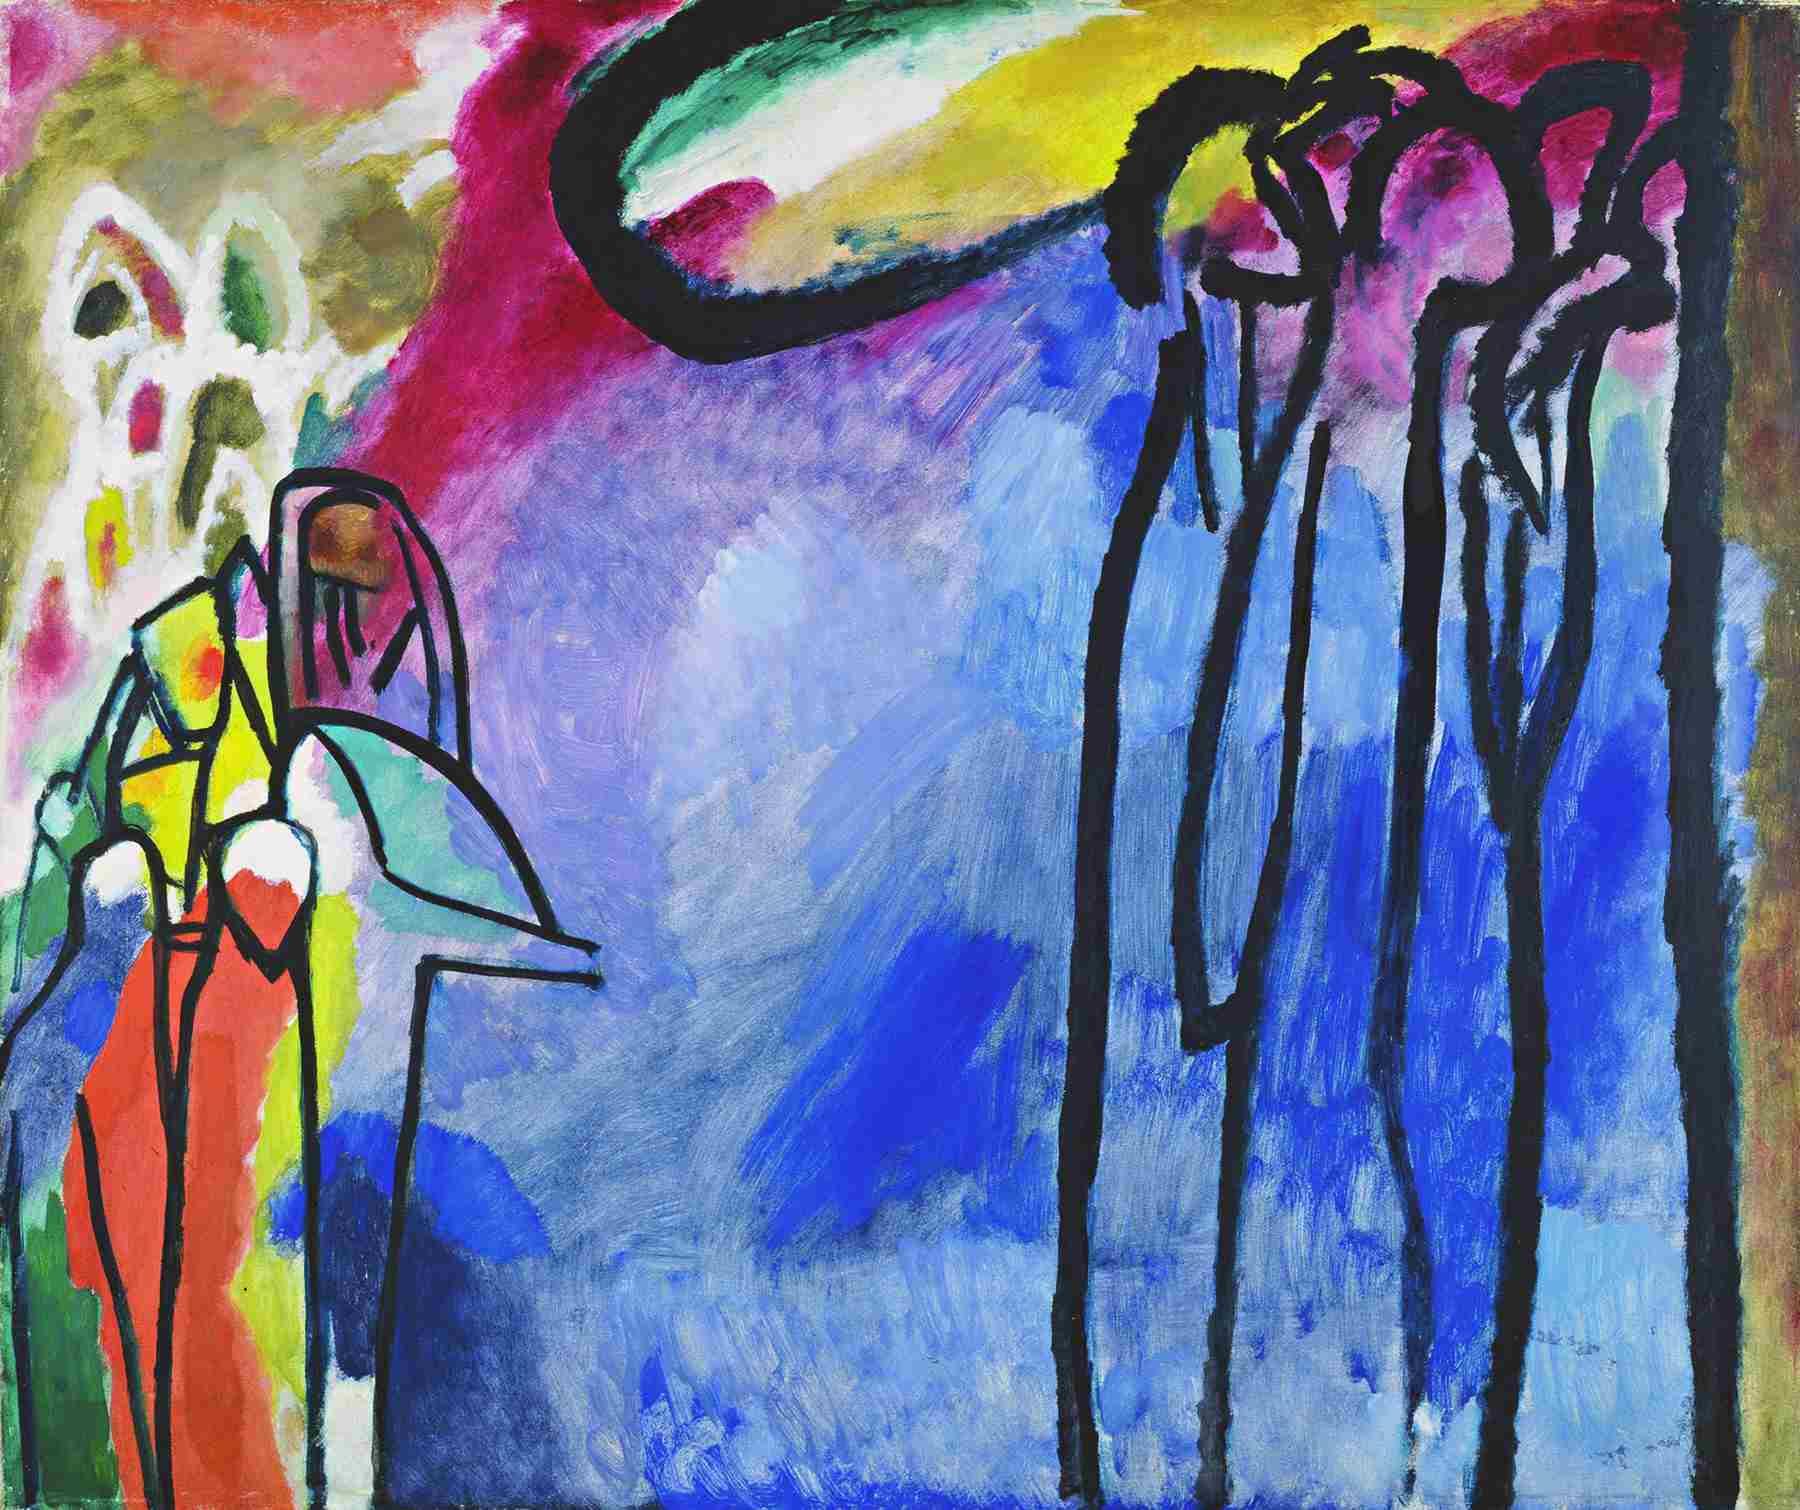 Wassily Kandinsky (Russian, 1866-1944) Wassily Kandinsky (Russian, 1866-1944). Improvisation 19, 1911. Oil on canvas. 47 3/16 x 55 11/16 in. (120 x 141.5 cm). Gabriele Münter-Stiftung, 1957. Städtische Galerie im Lenbachhaus, Munich.